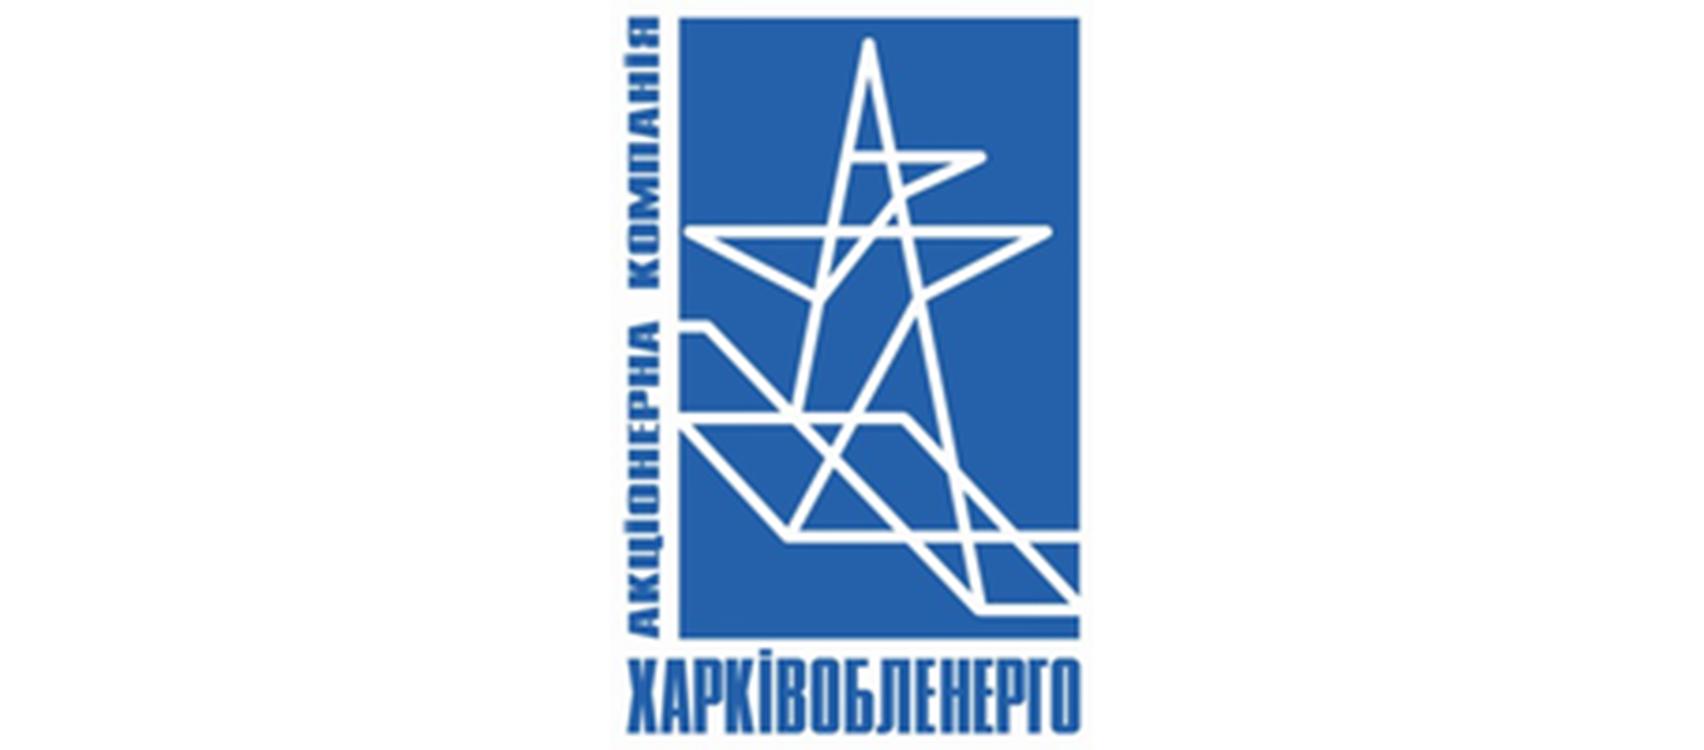 "Коломакське РВЕ АК ""Харківобленерго""  (за послуги до 31.12.2018)"